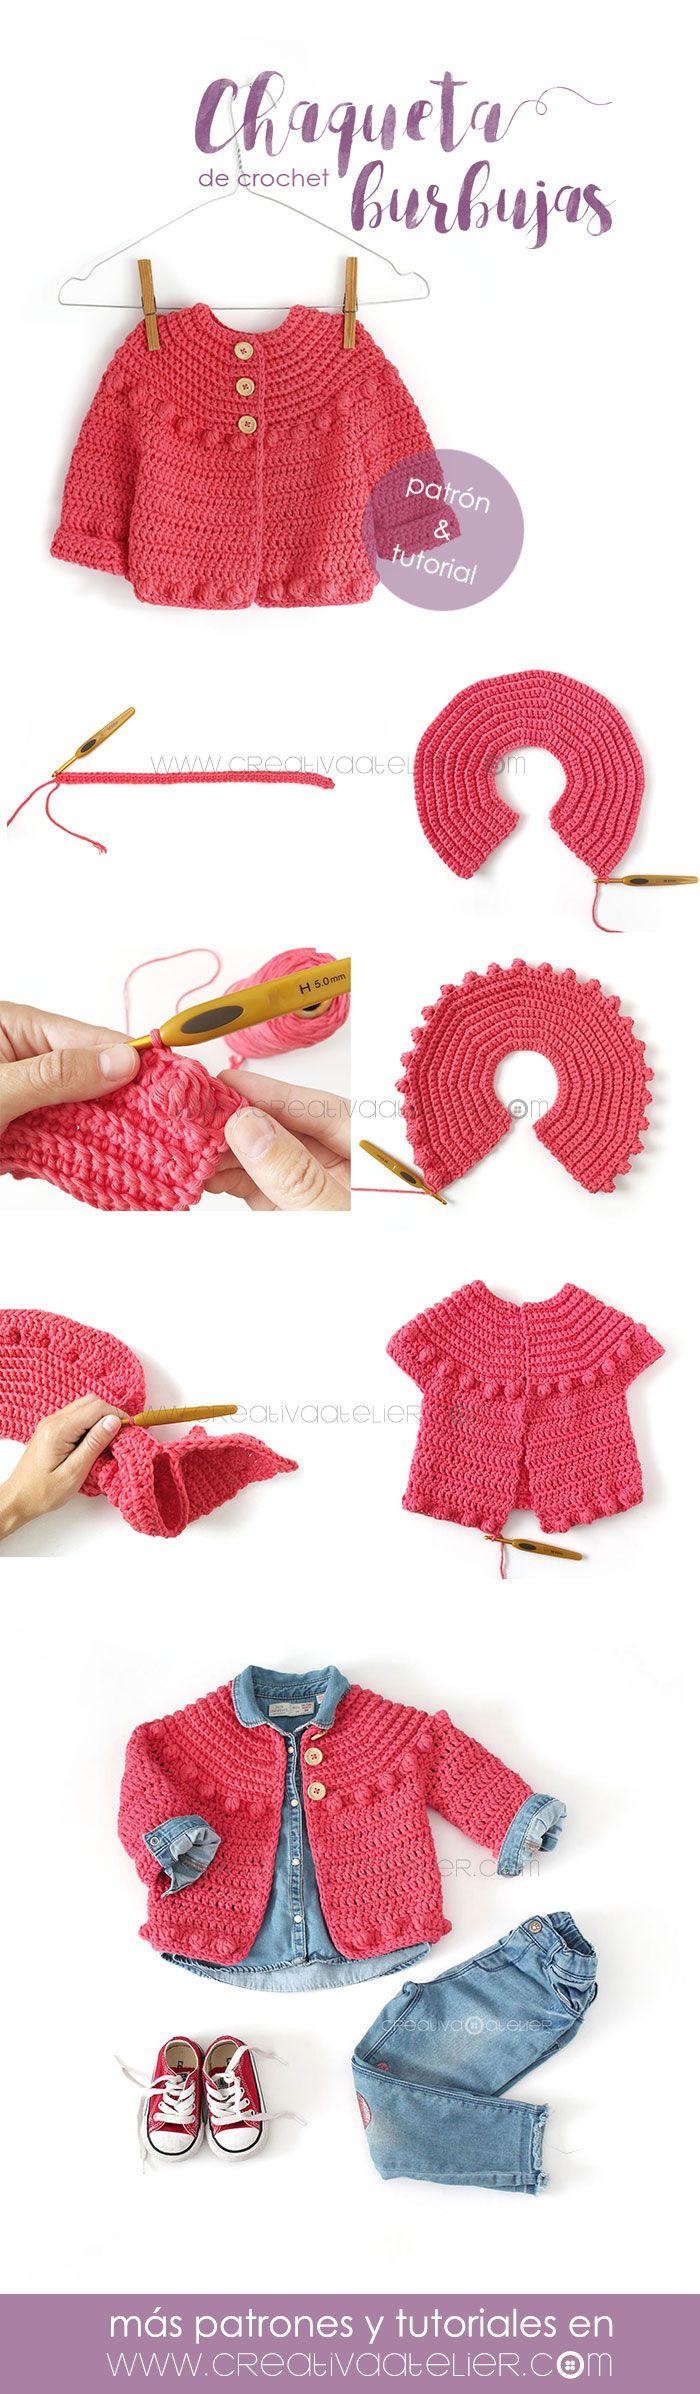 Jaqueta De Crochet Bolha Para Meninas - Pattern and Tutorial -